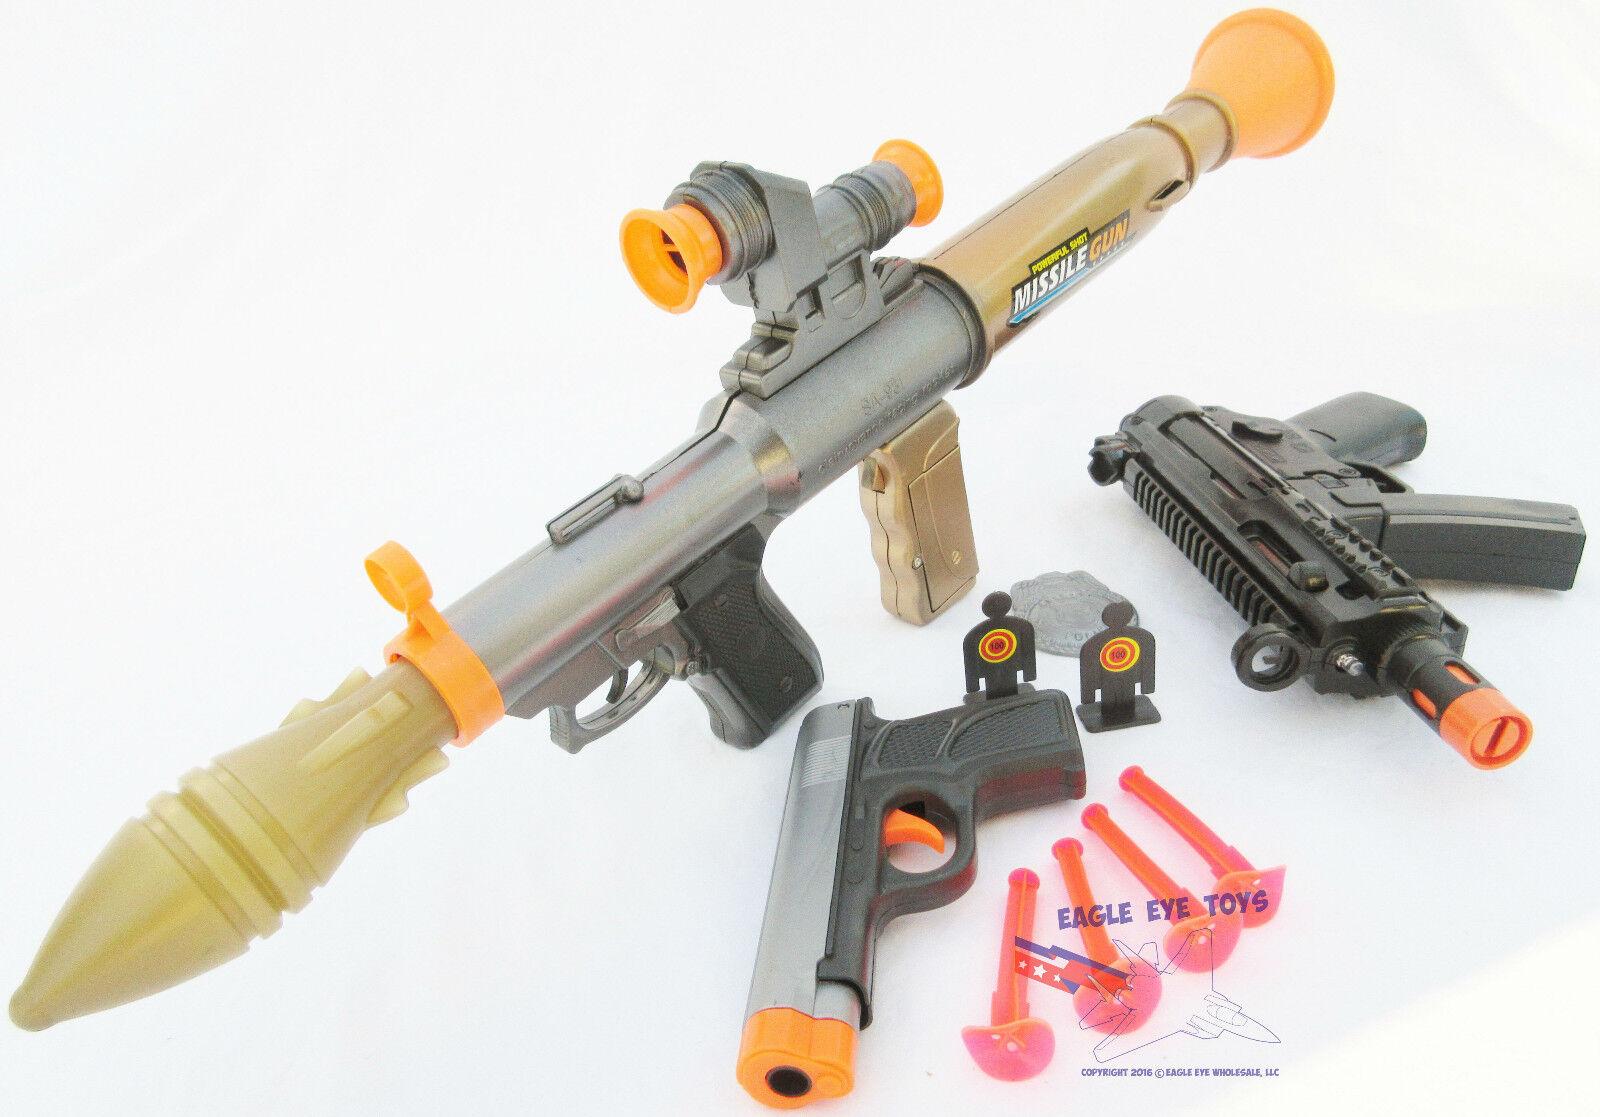 3x Toy Guns Electronic Toy Bazooka & MP5 w  Mega Sound FX Grey 9MM Dart Pistol